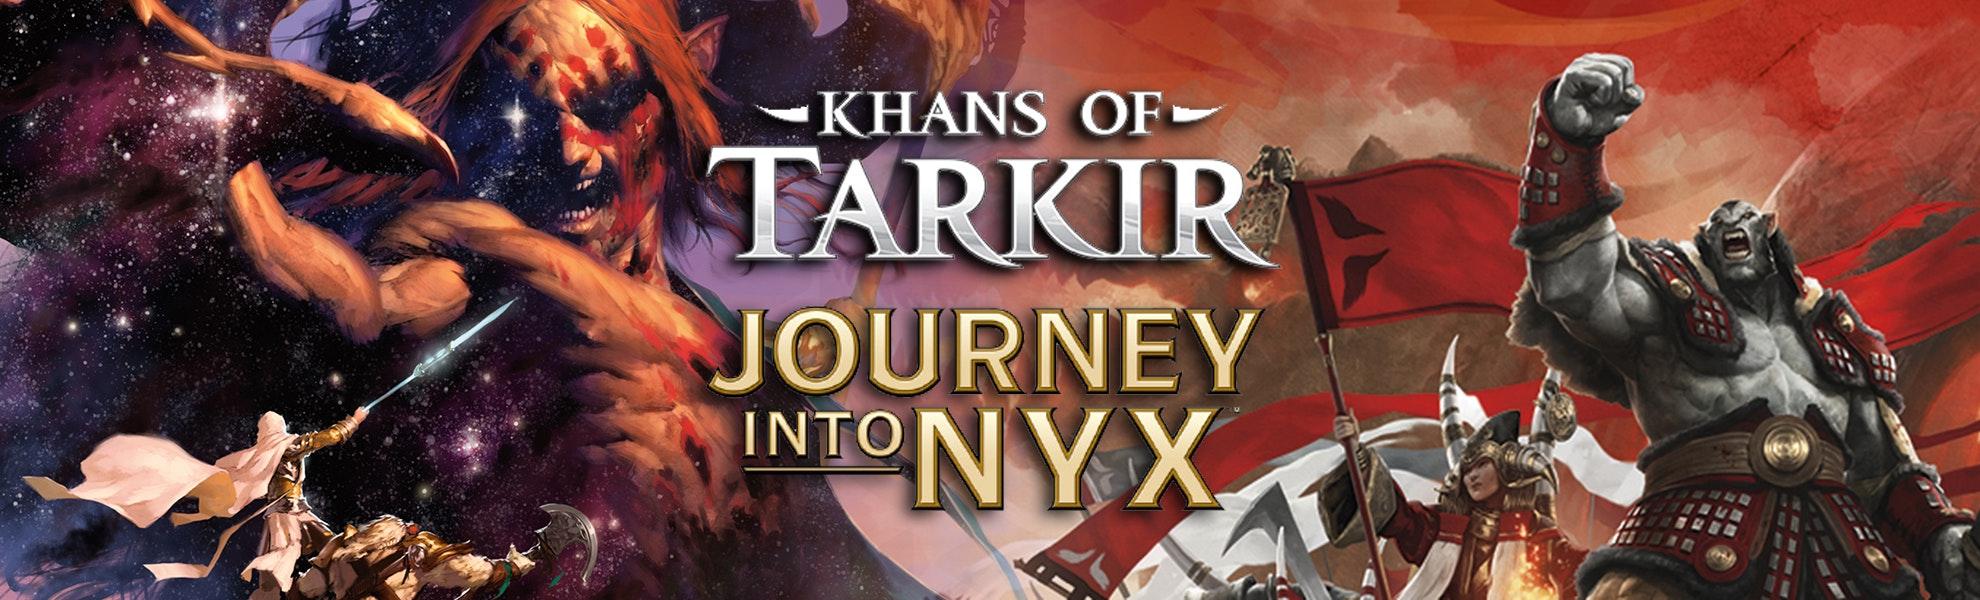 Khans of Tarkir & Journey Into Nyx Event Decks